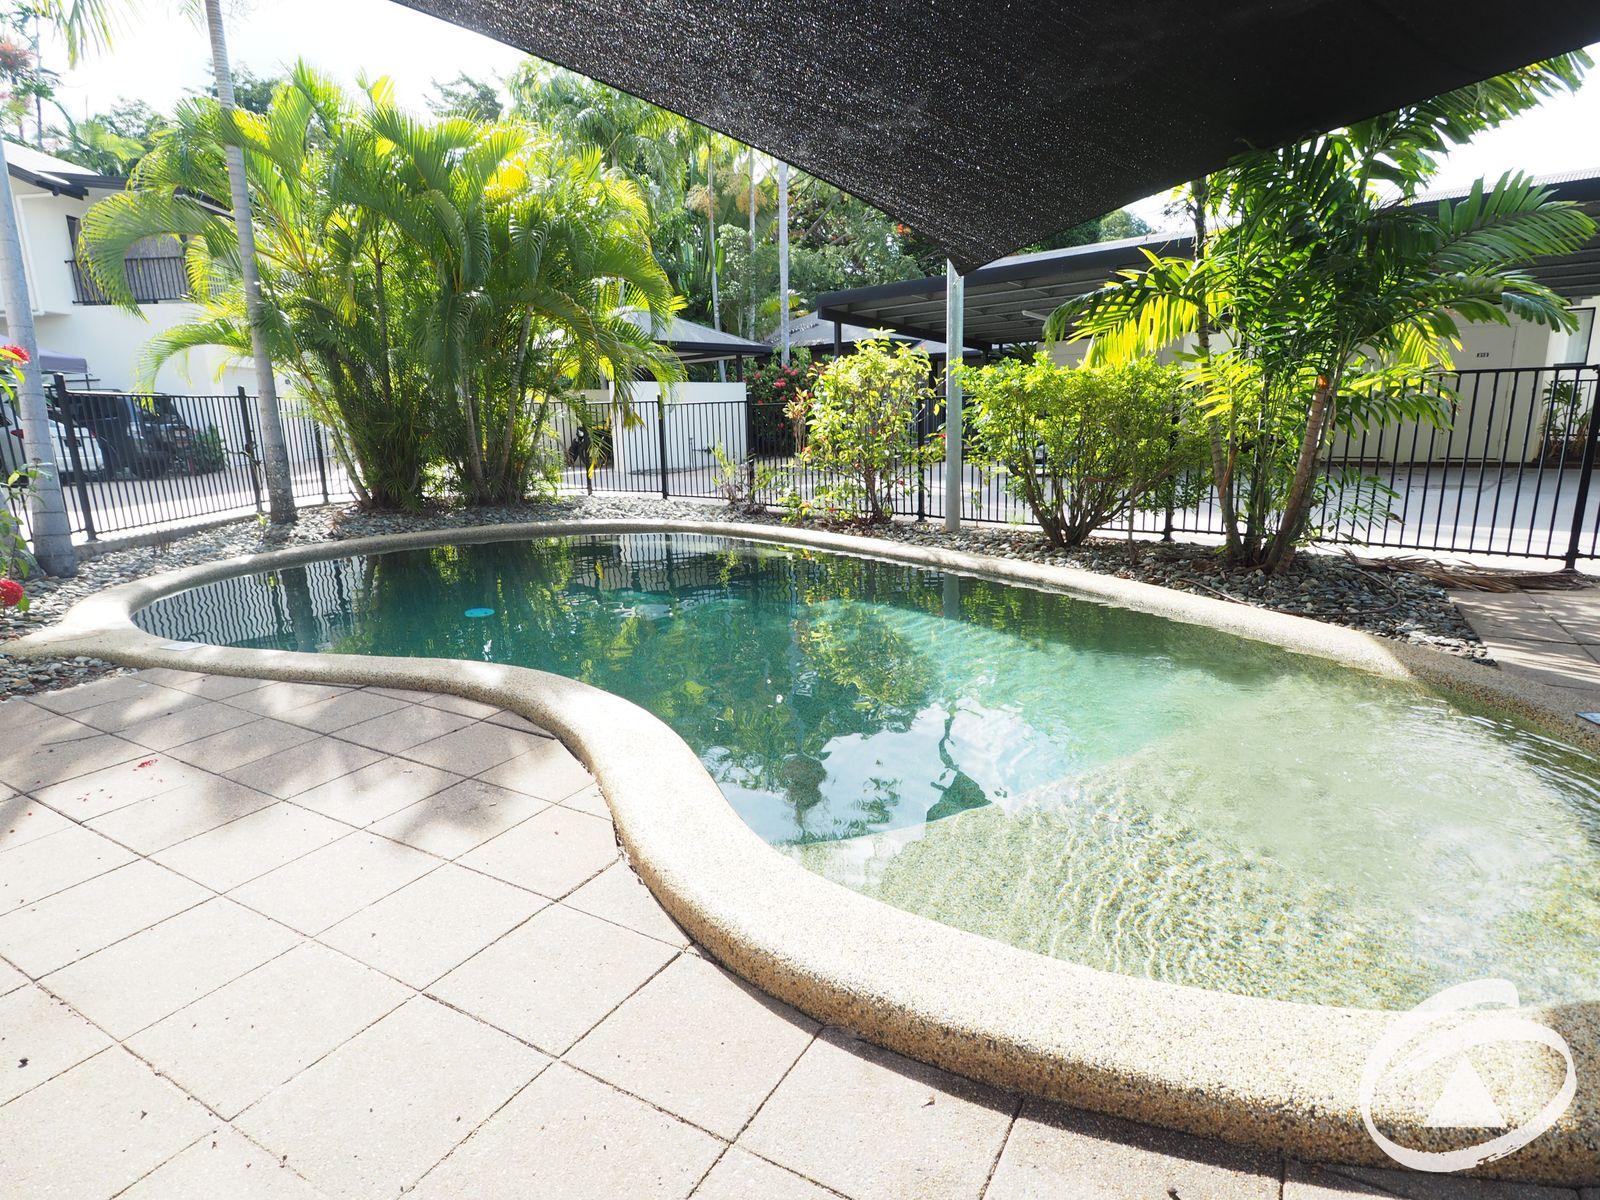 221/11-15 Charlekata Close, Freshwater, QLD 4870